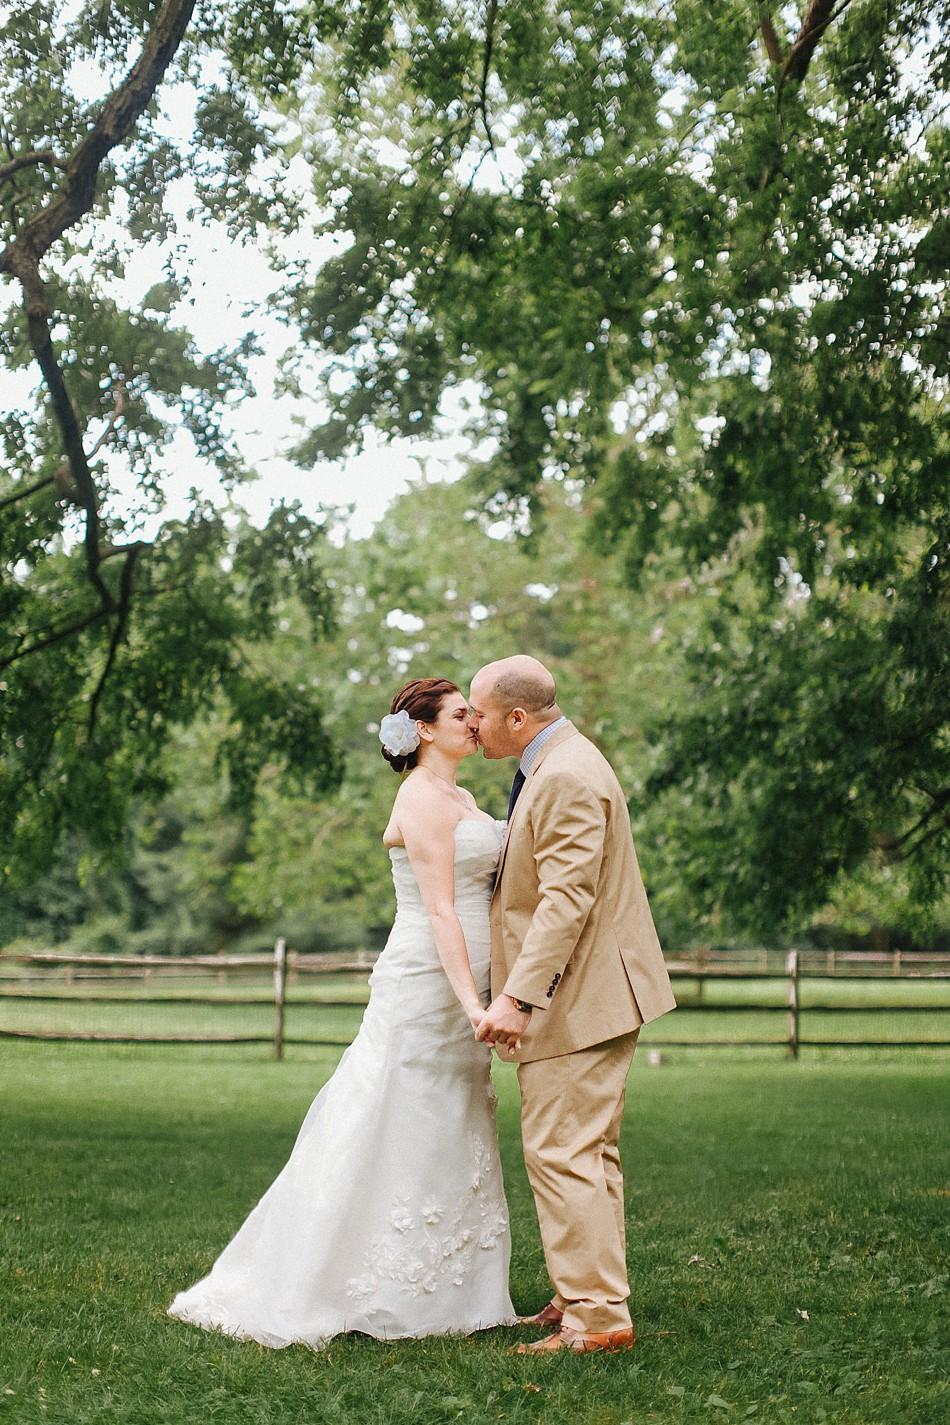 the_inn_at_grace_winery_wedding_0006.jpg